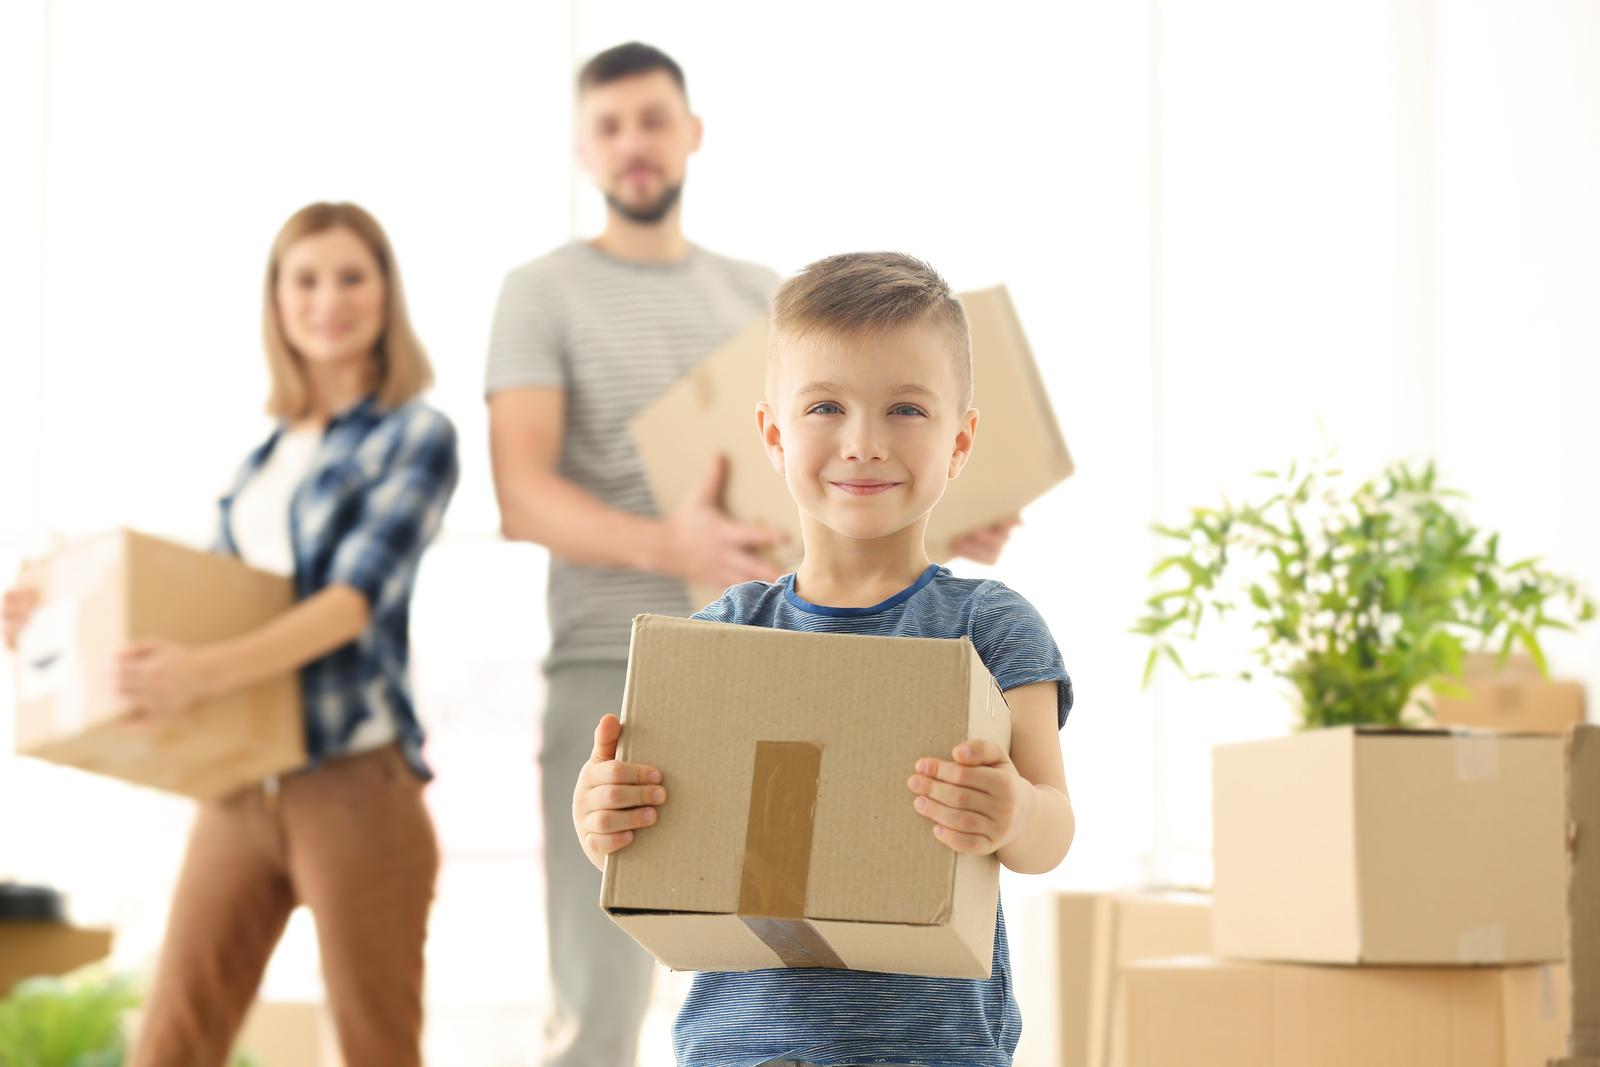 7 Tips To Make Moving Easier On Kids